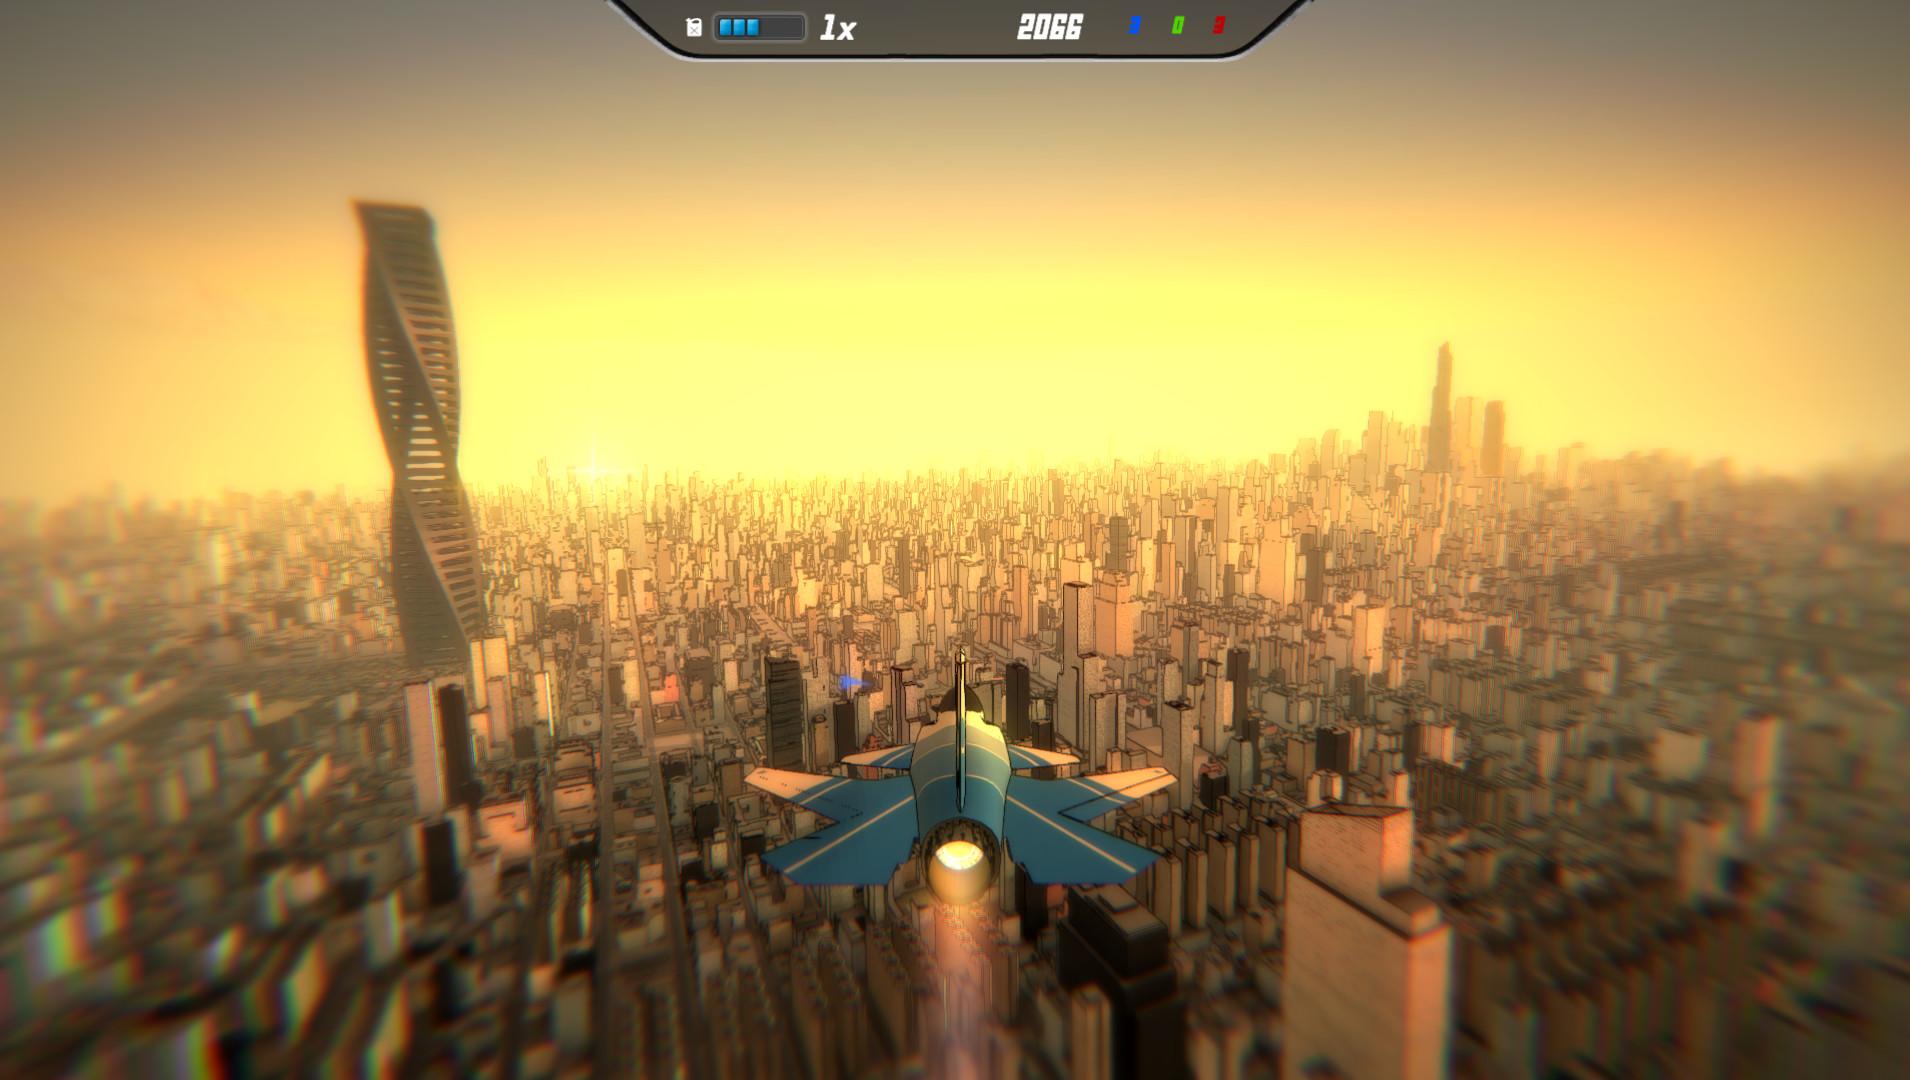 What's On Steam - Infinite Skyline: Superflight